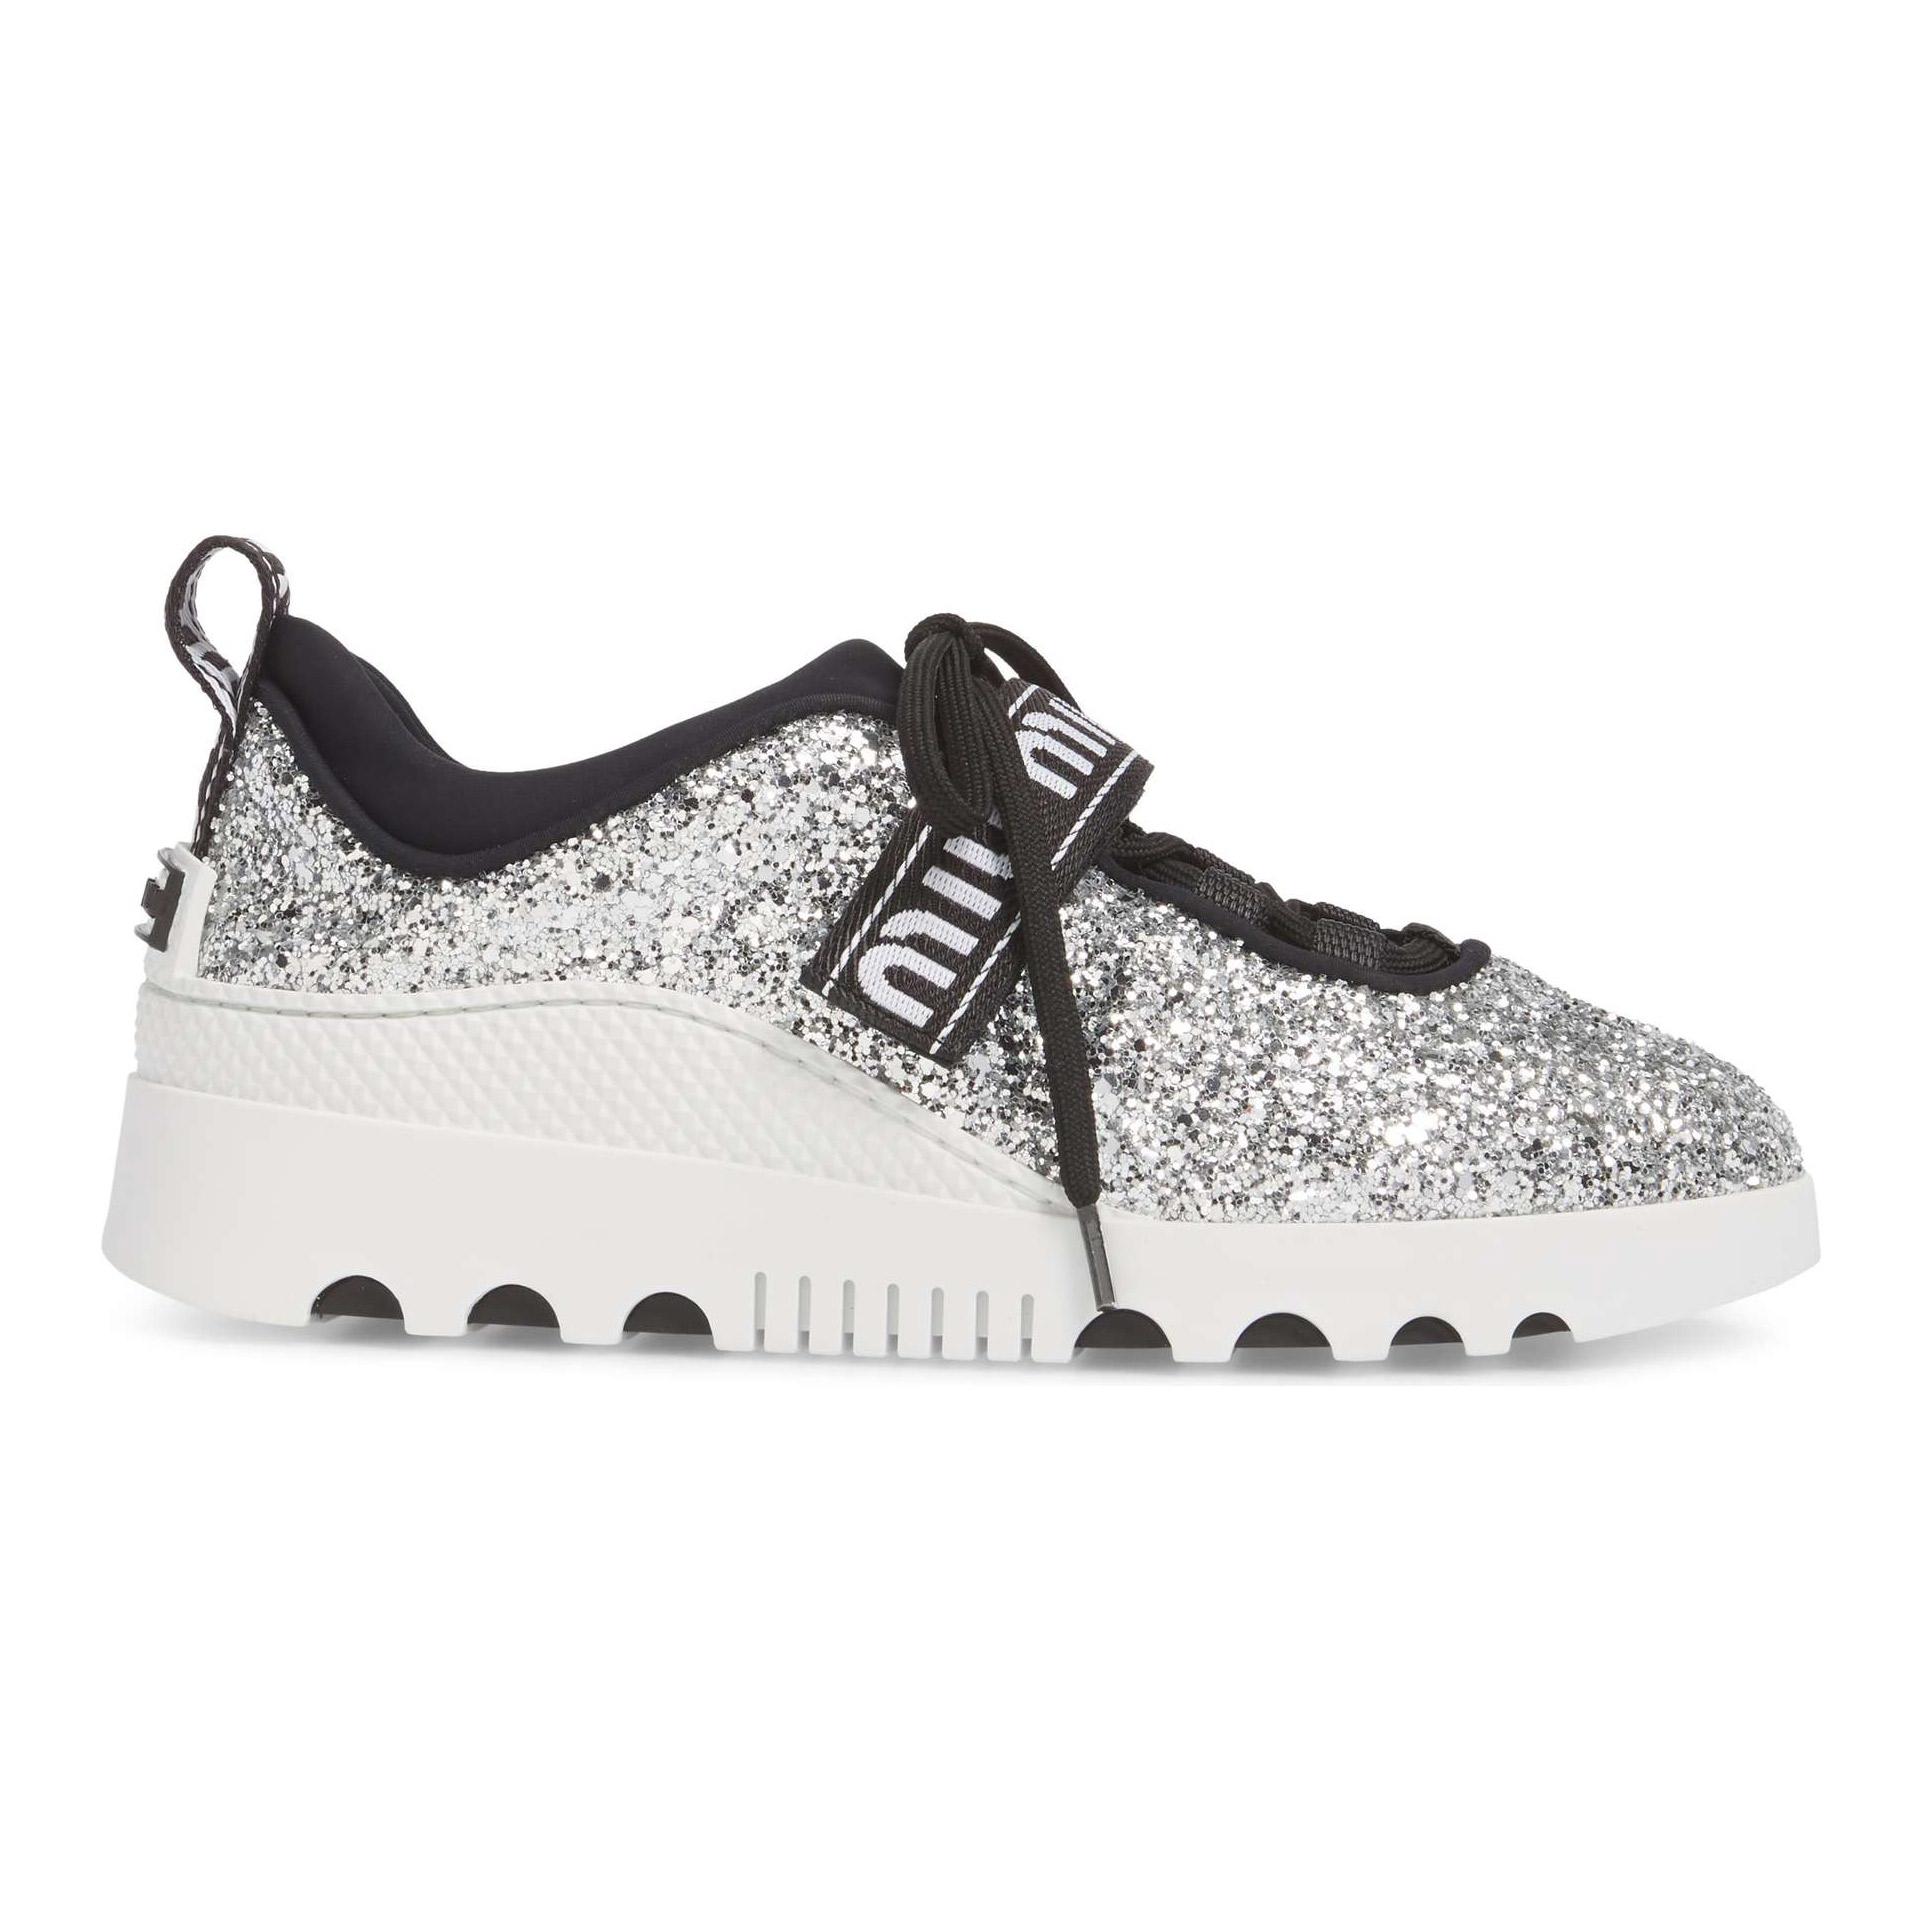 fa7e4a4f51 Shop Spring 2018 s Best Sneakers - Coveteur